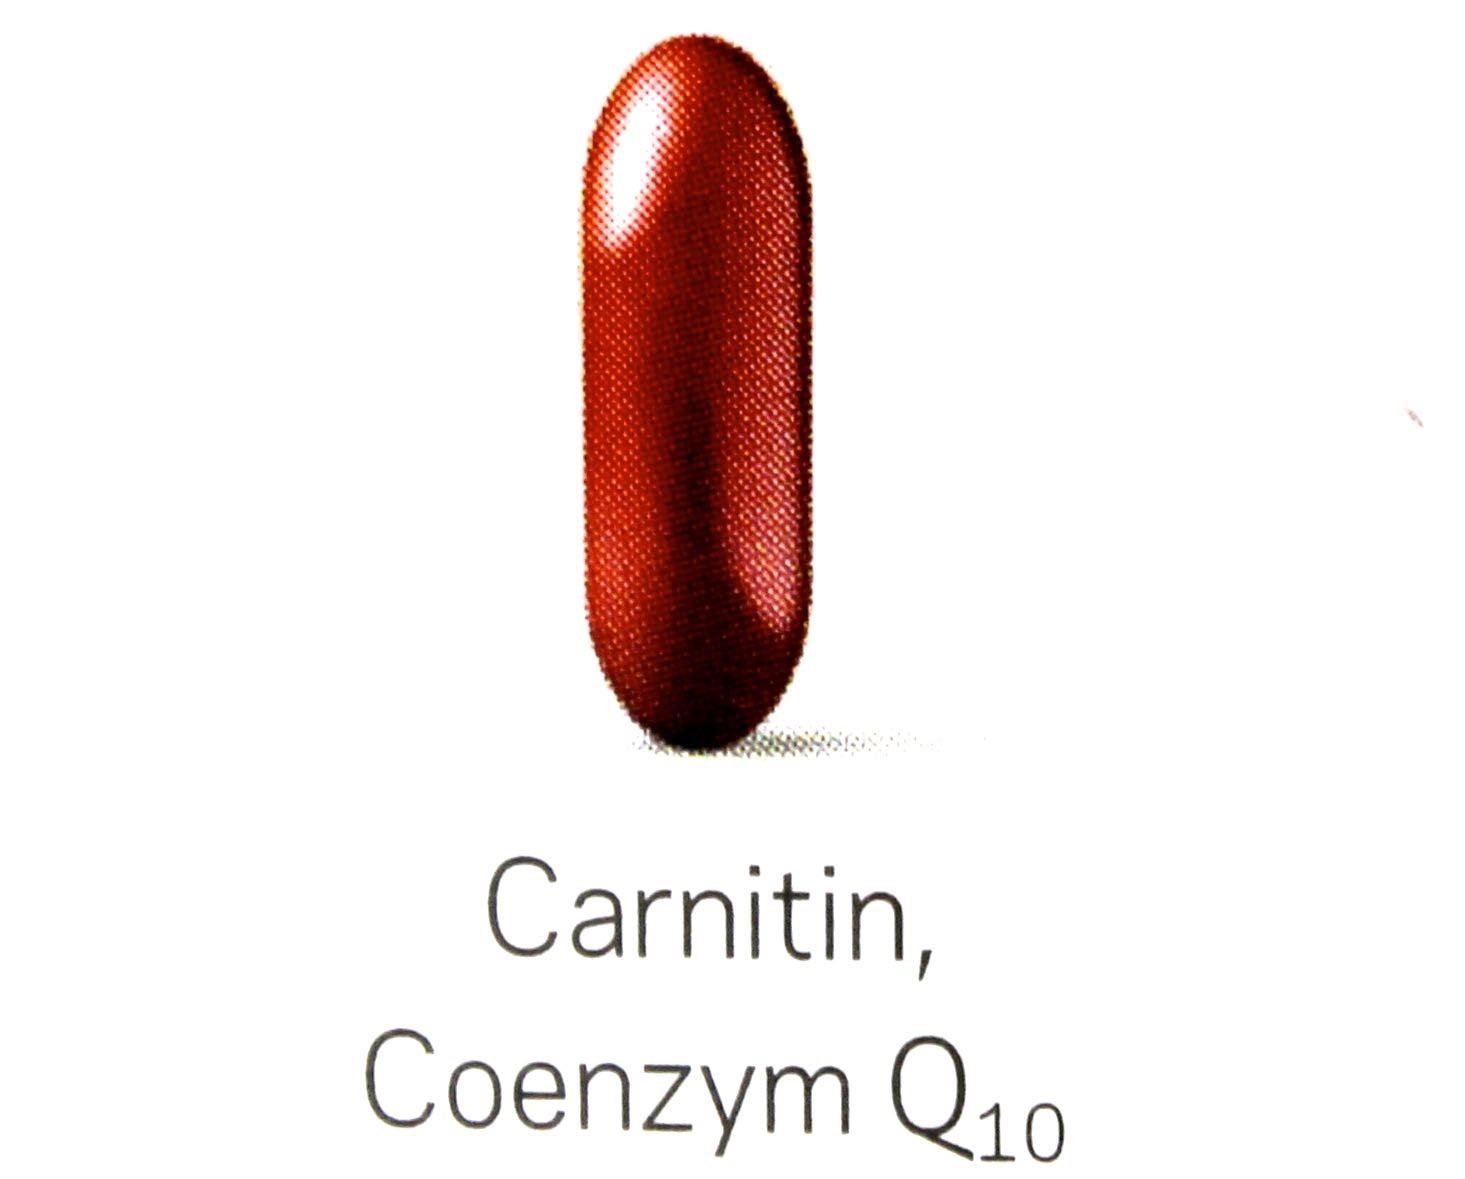 Carnitin_Kapsel